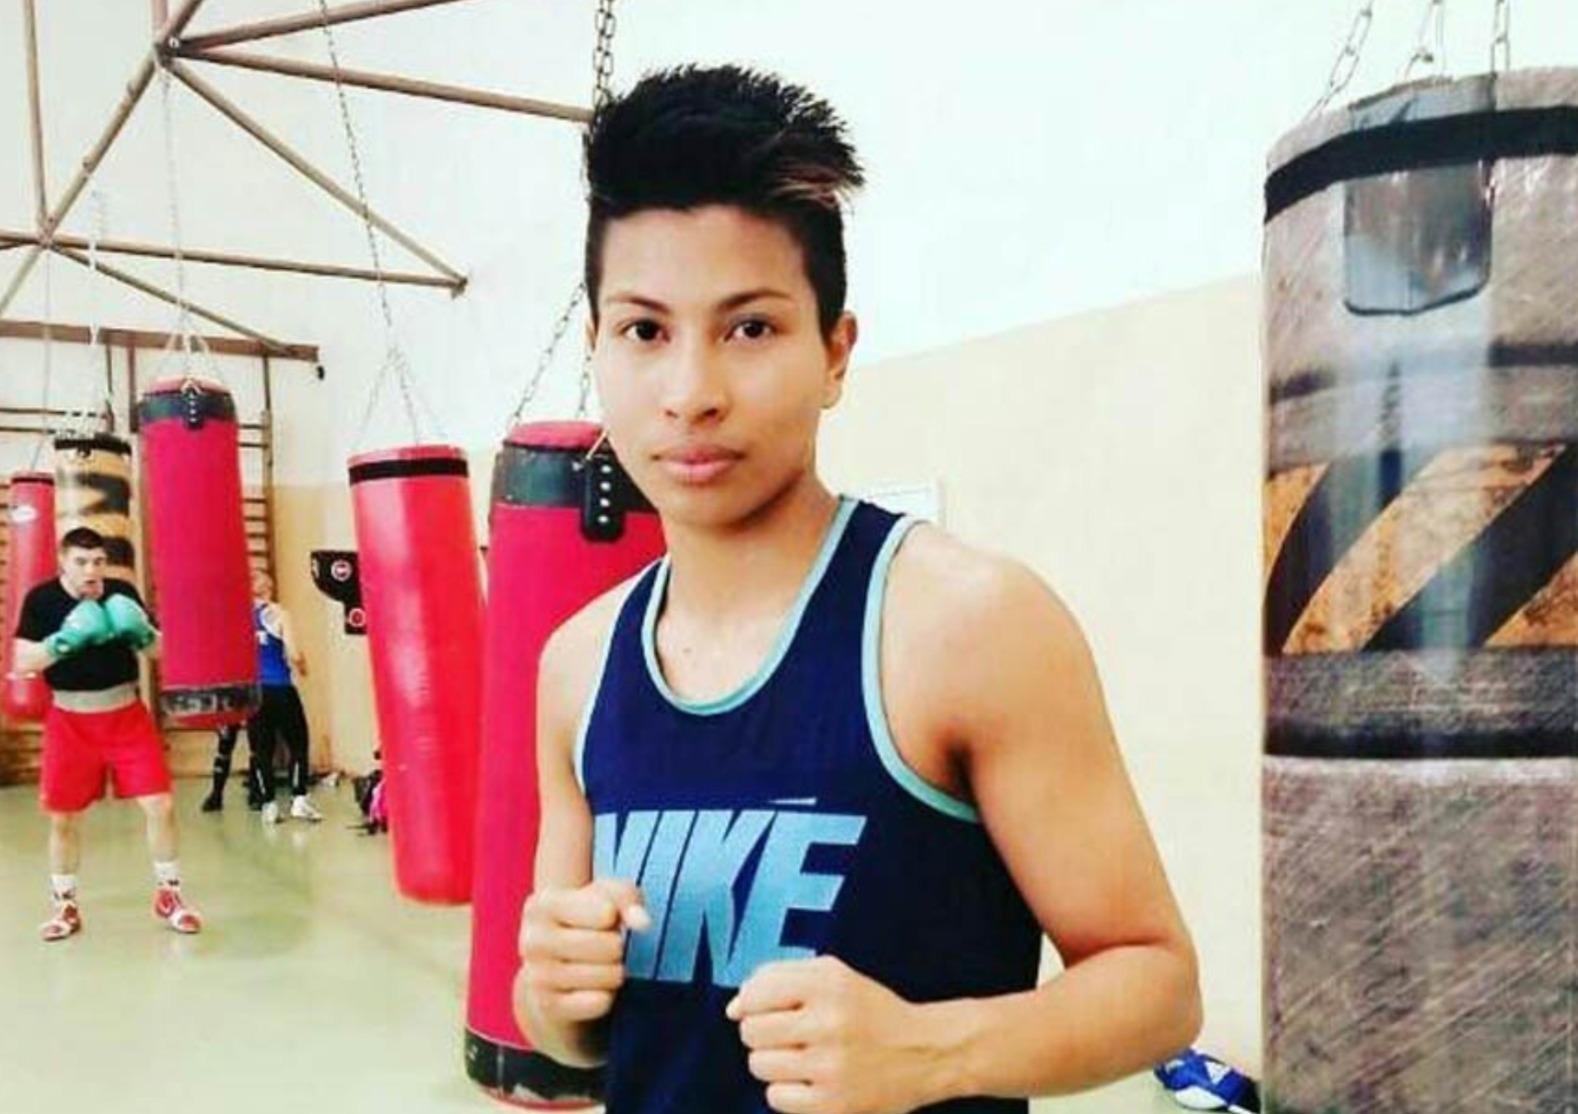 Assam boxer Loveleena Borgohain wins first bout - Sentinelassam